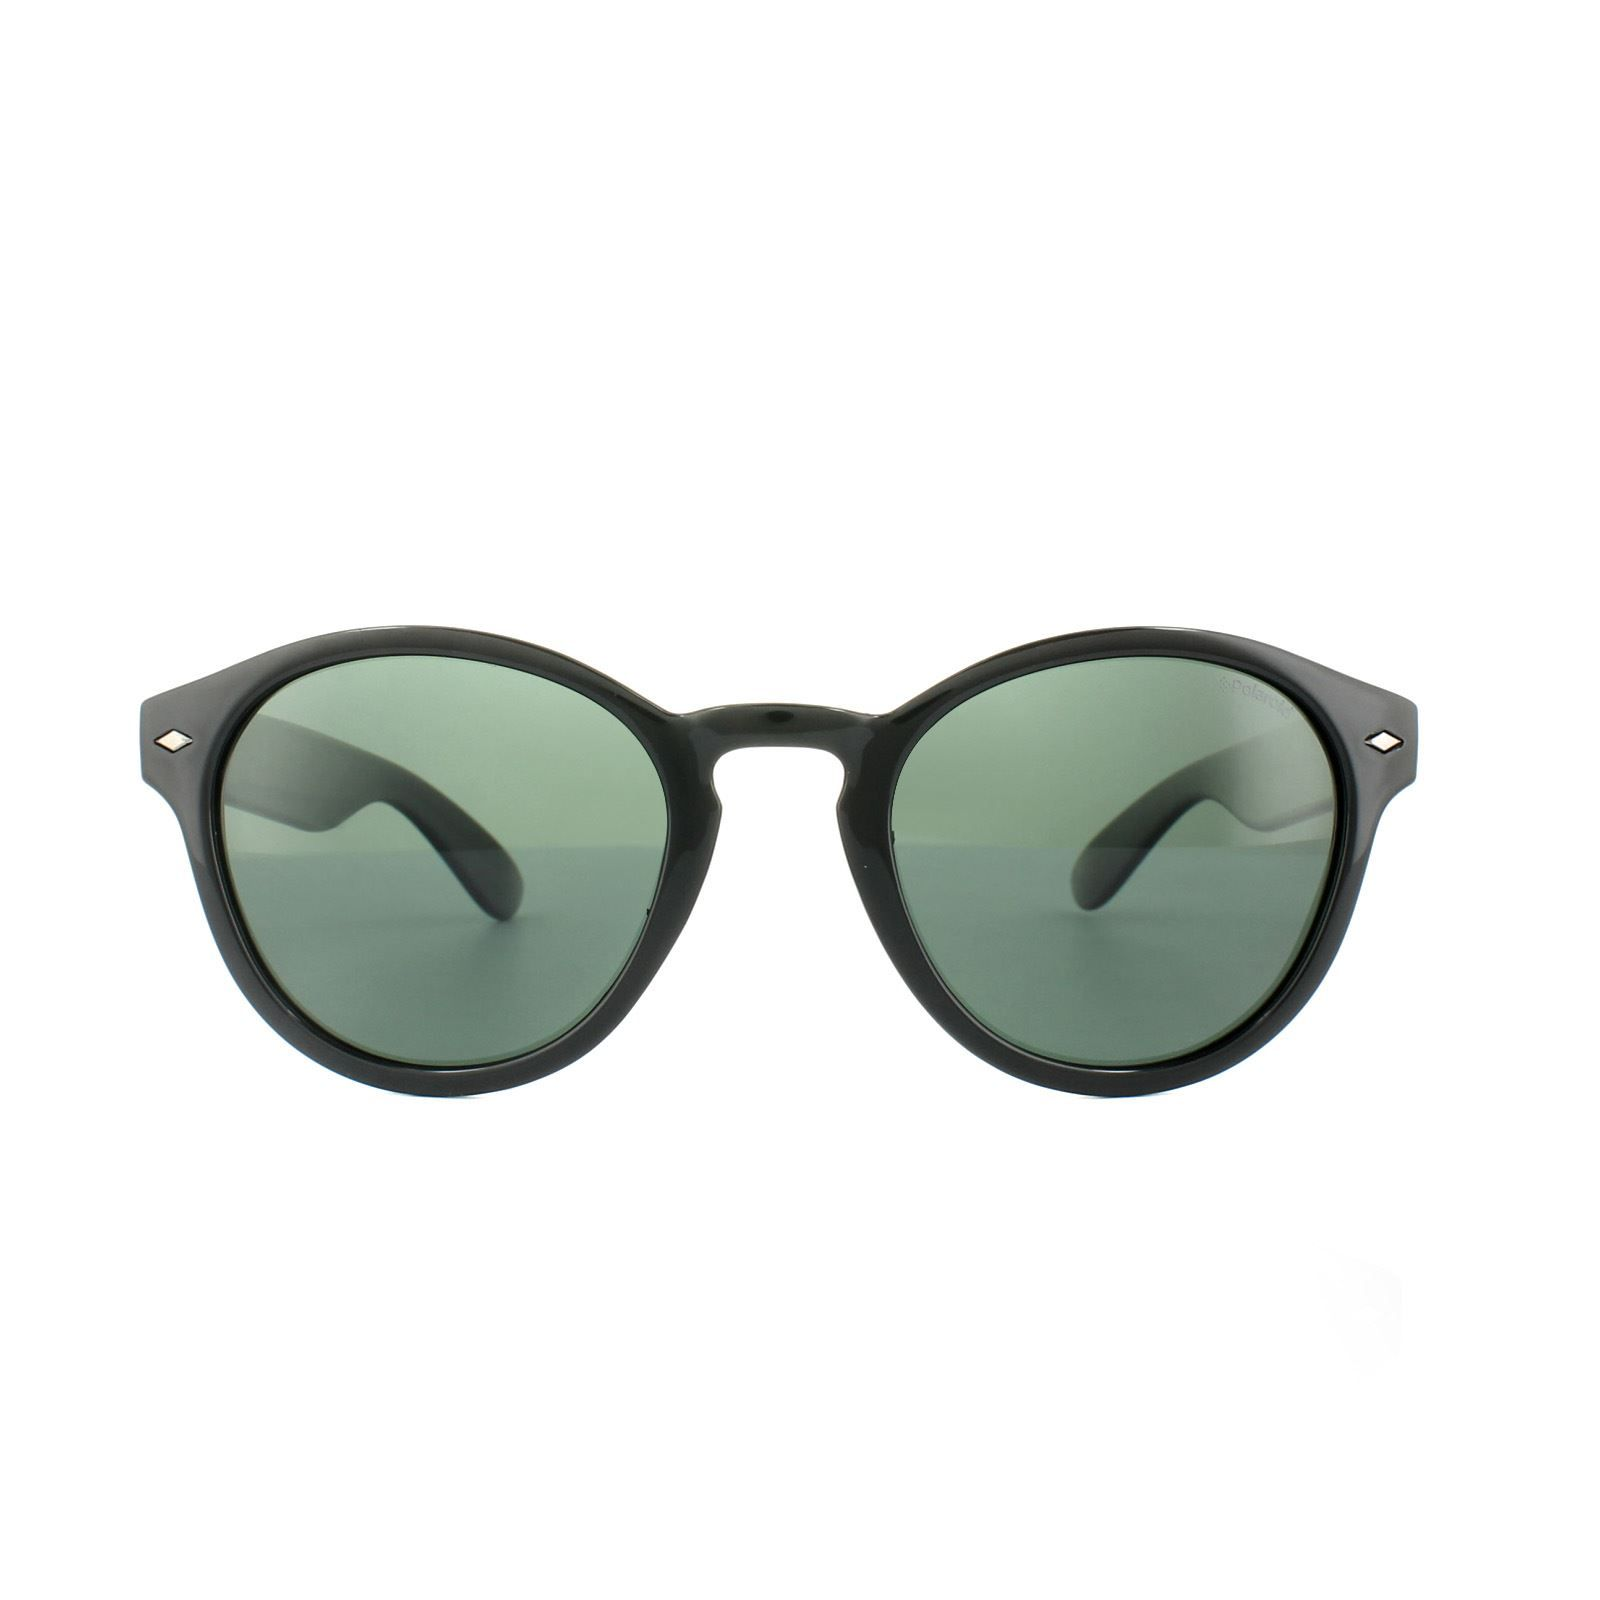 Polaroid Sunglasses PLD 1018/S D28 H8 Shiny Black Green Polarized